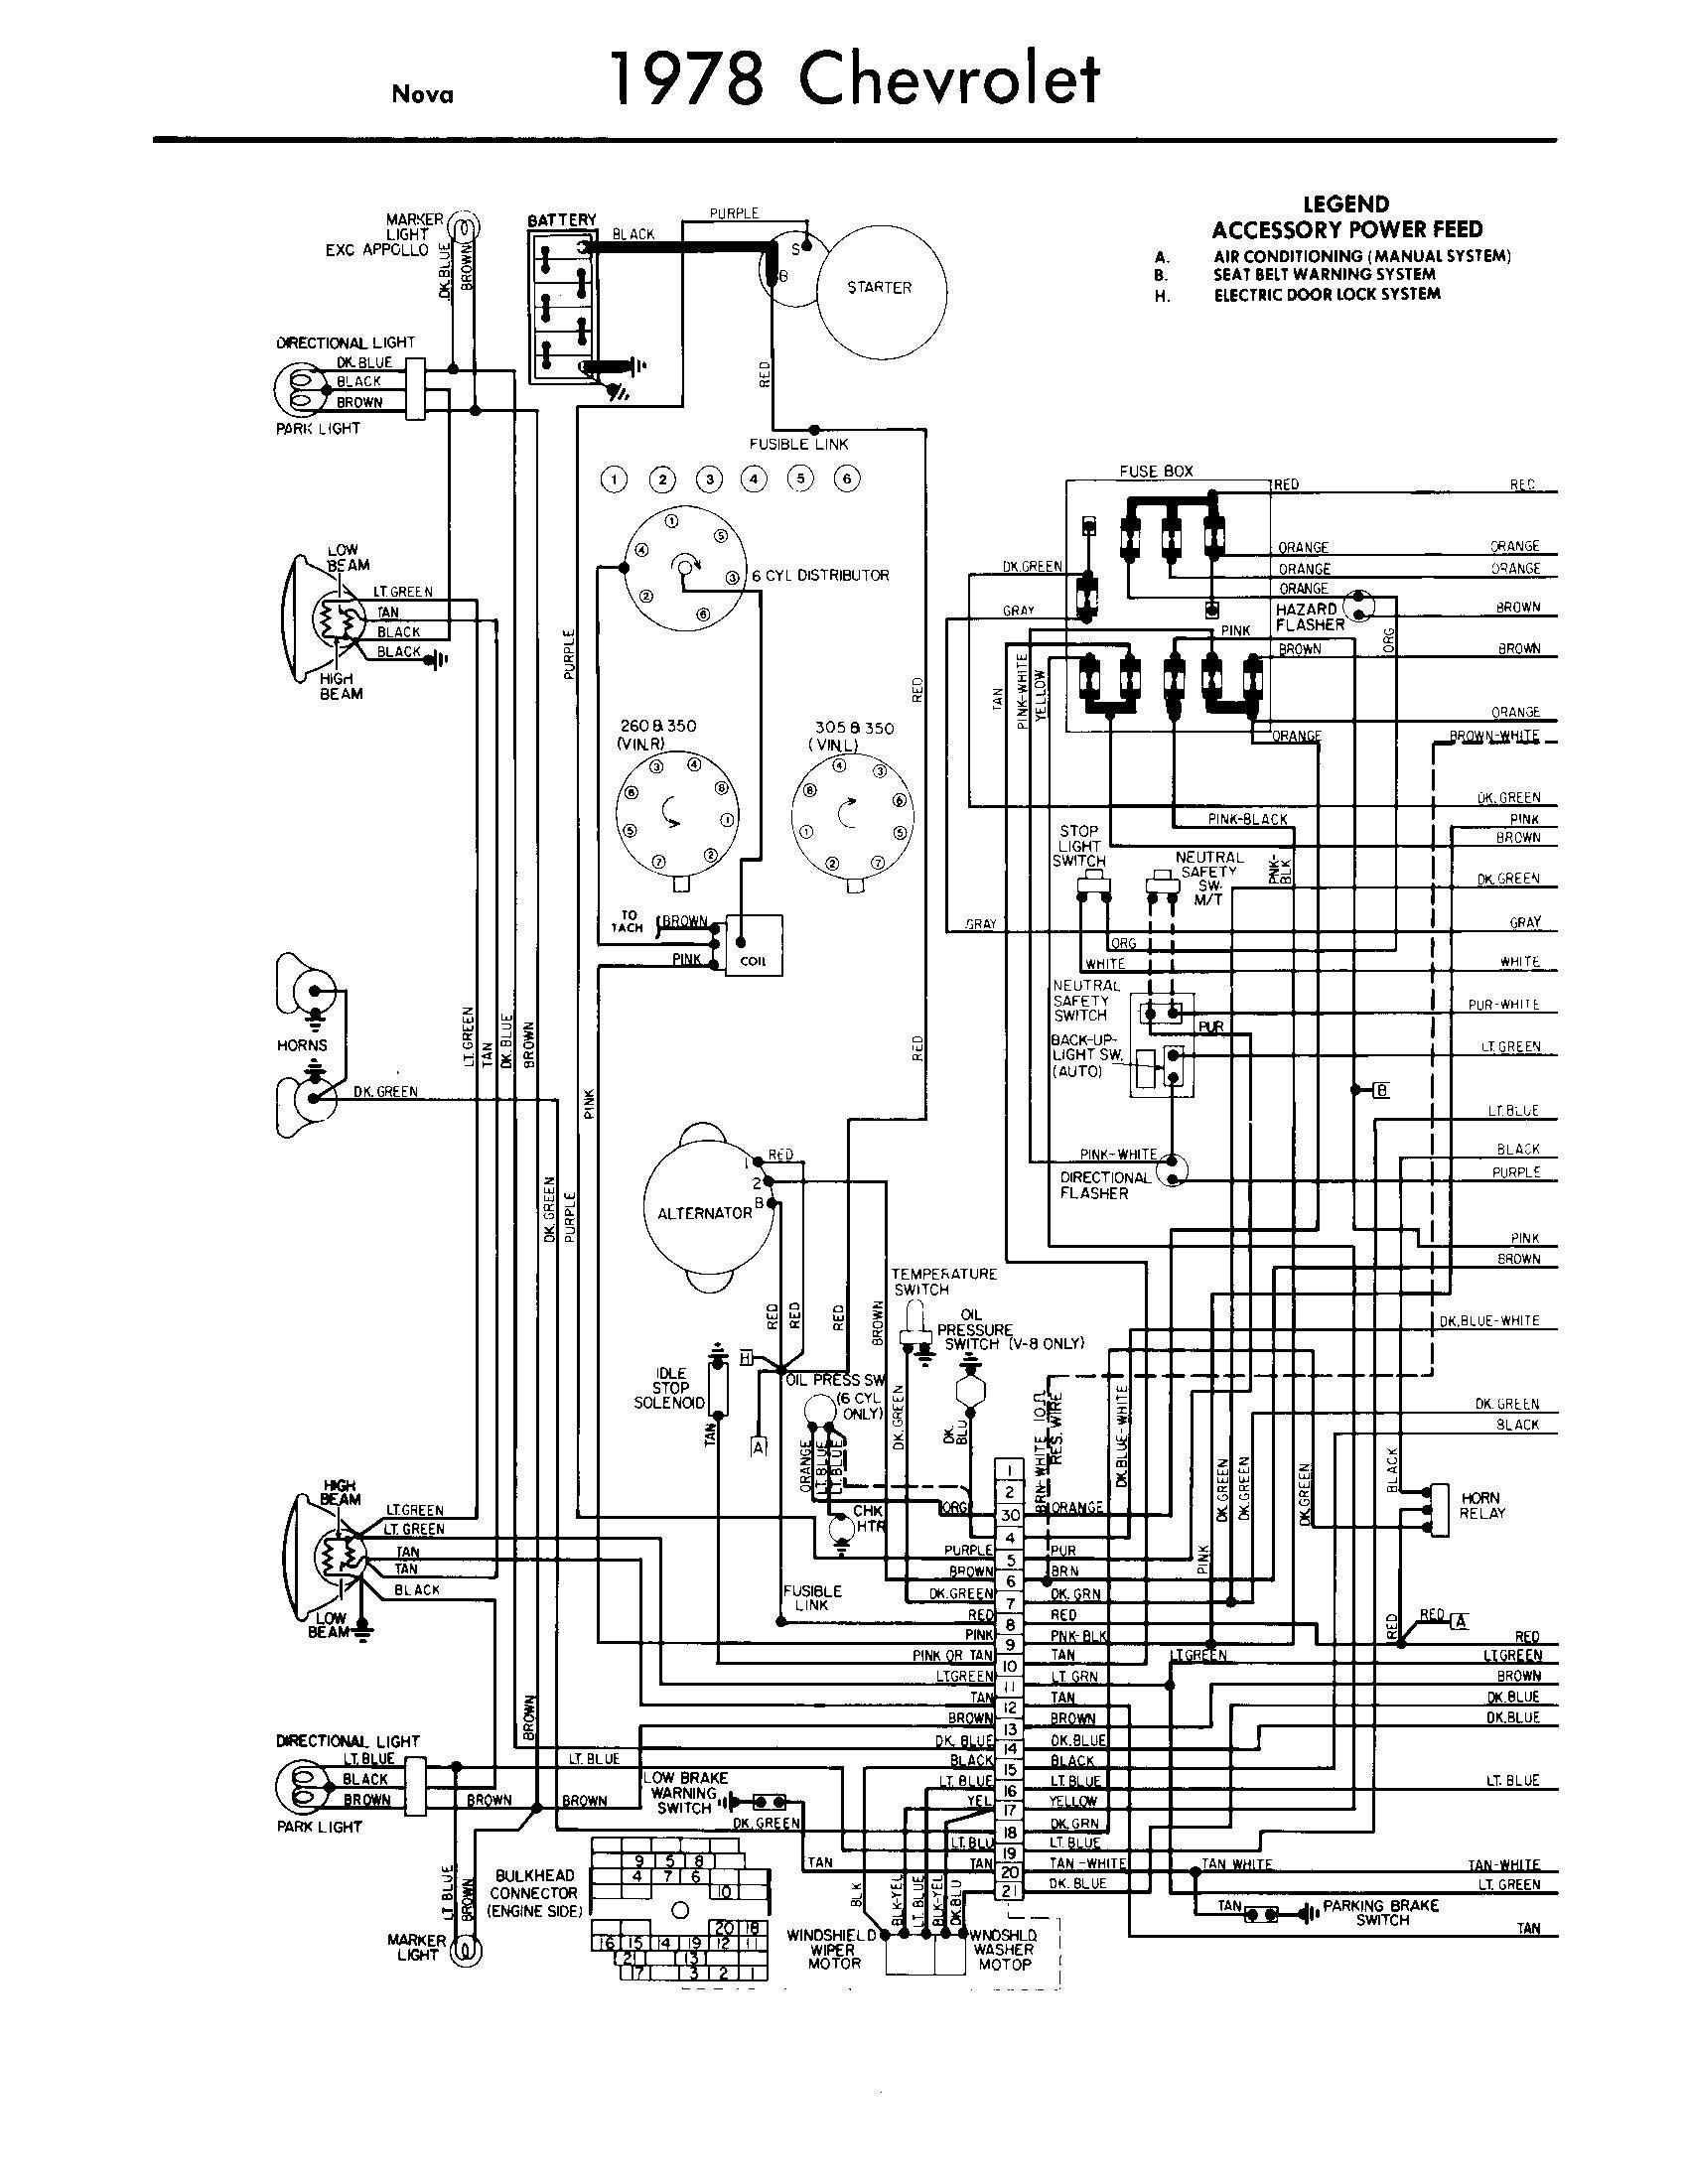 DIAGRAM] 1964 Chevy Pickup Alternator Wiring Diagram FULL Version HD  Quality Wiring Diagram - 149054.ACCNET.FRHeater Switch Wiring Diagram - accnet.fr